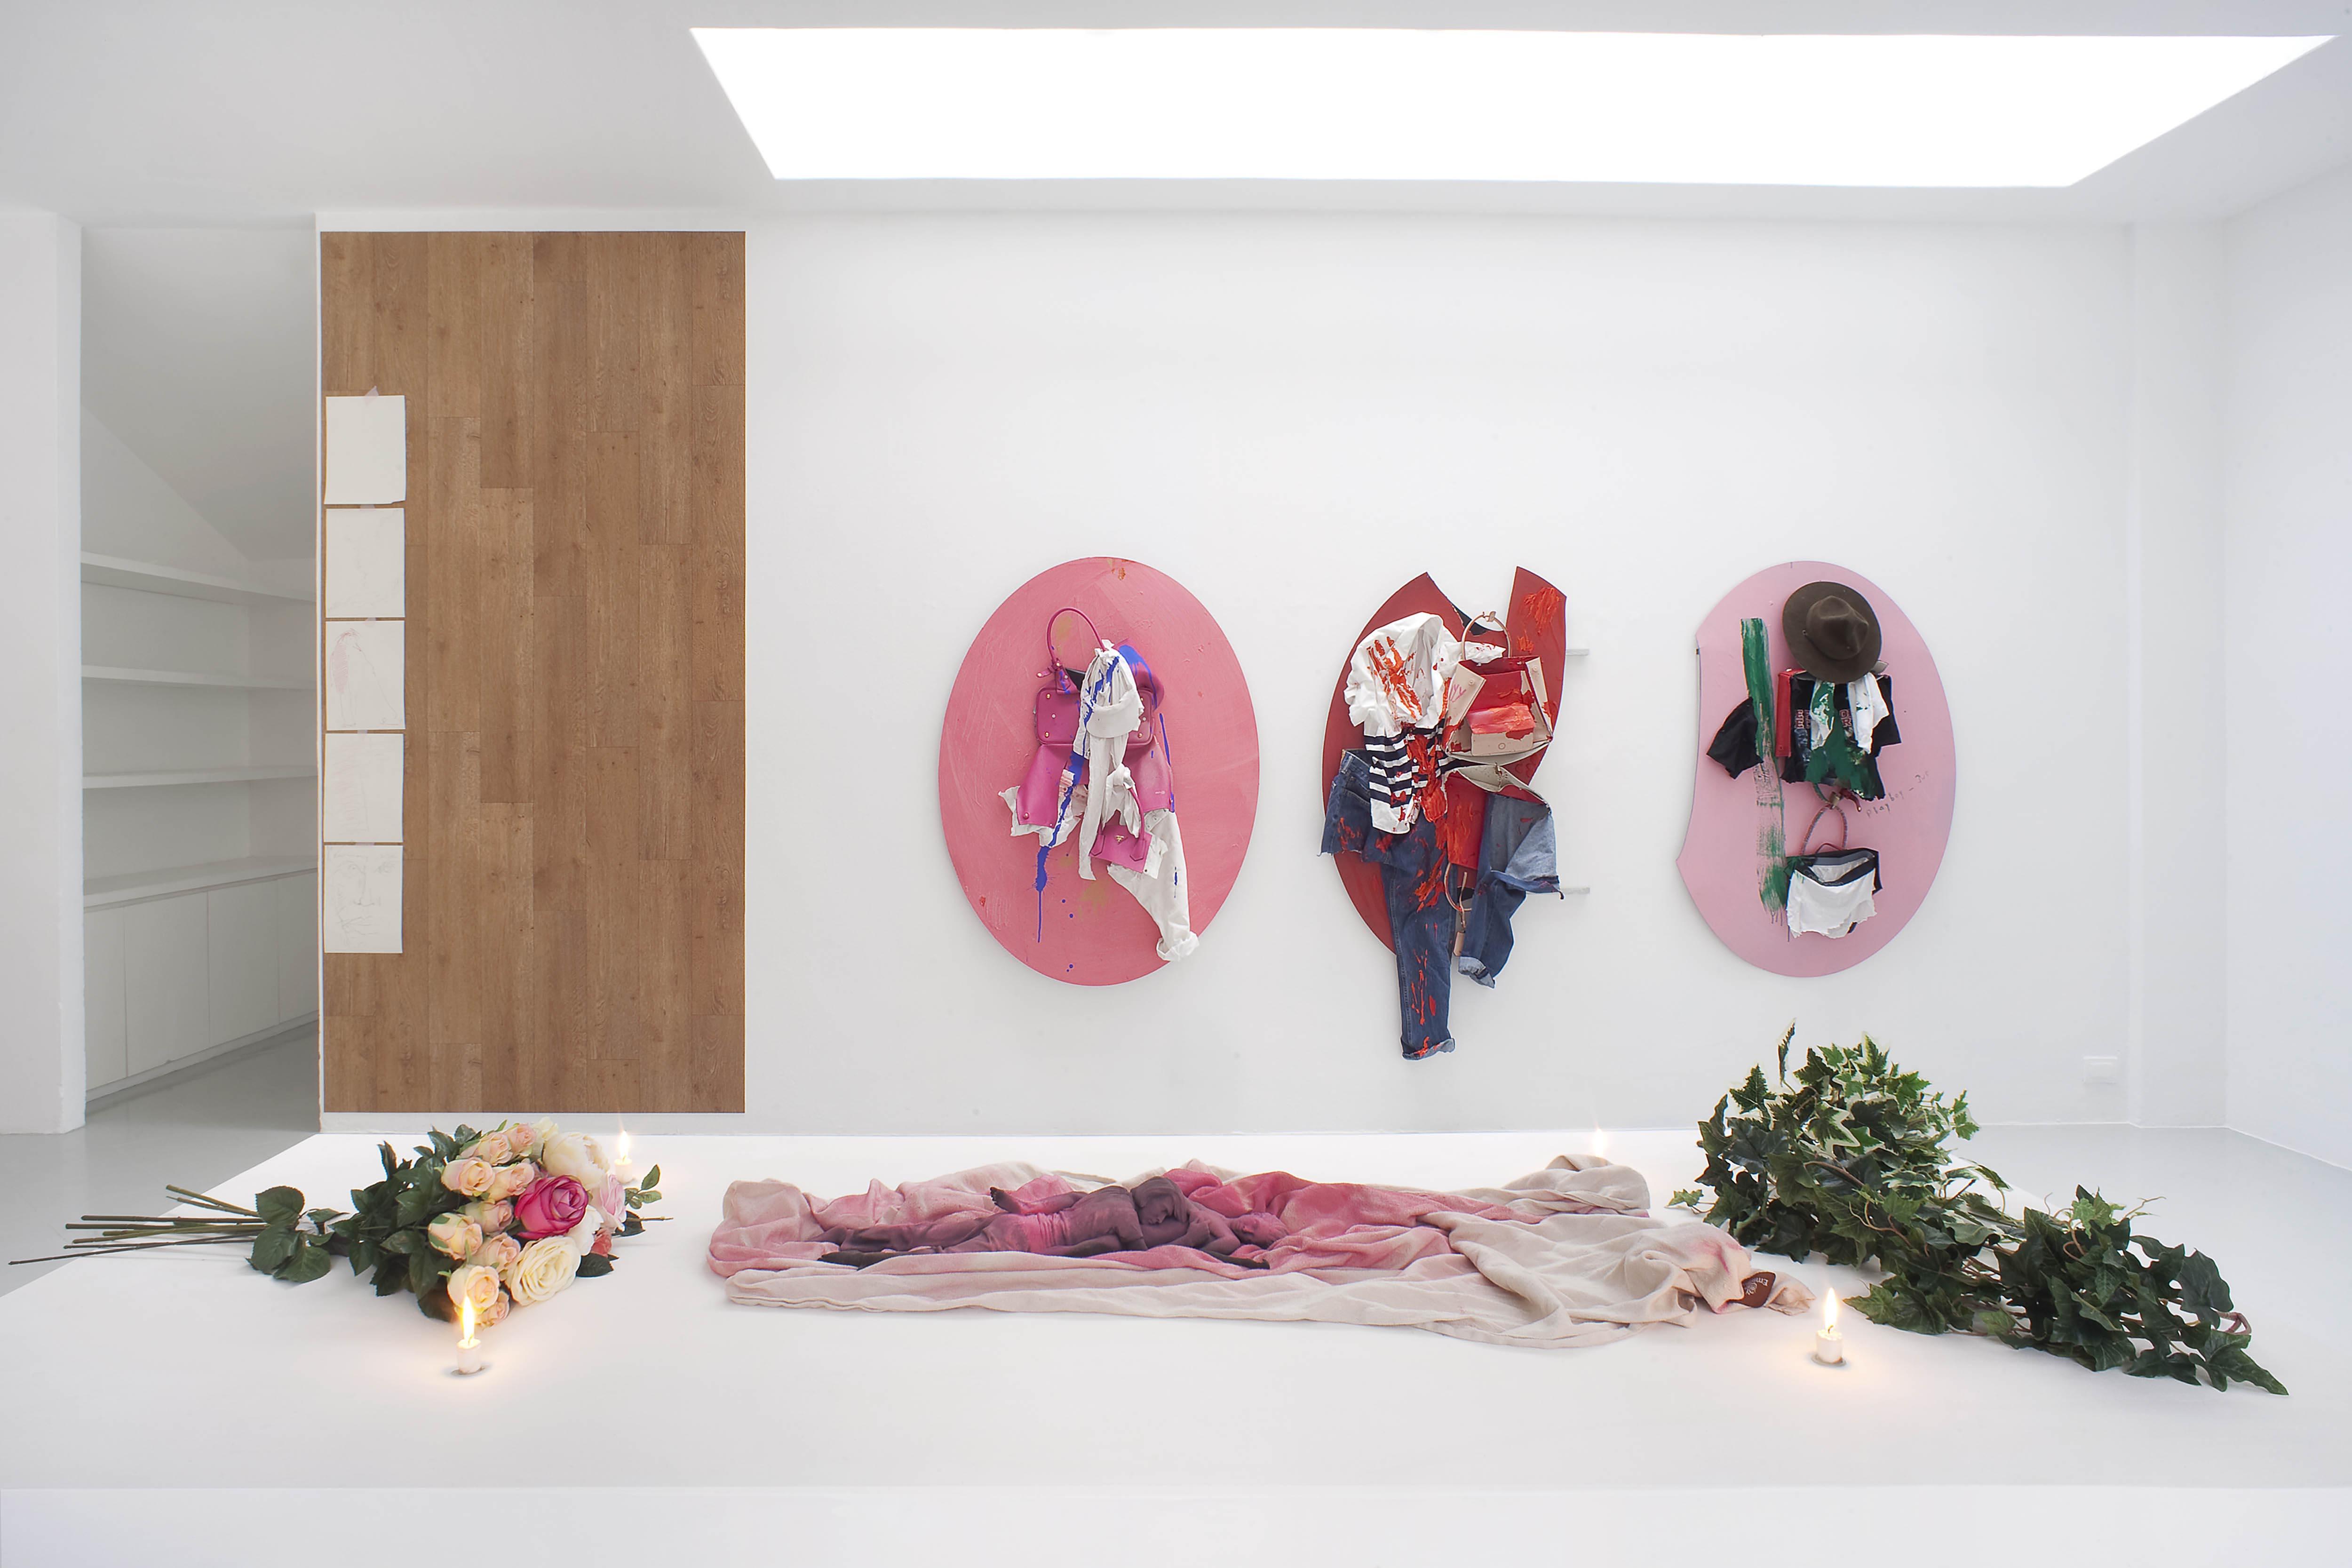 4 - Yves Scherer Installation view 2015 - Courtesy Studiolo Milan - Photo Filippo Armellin